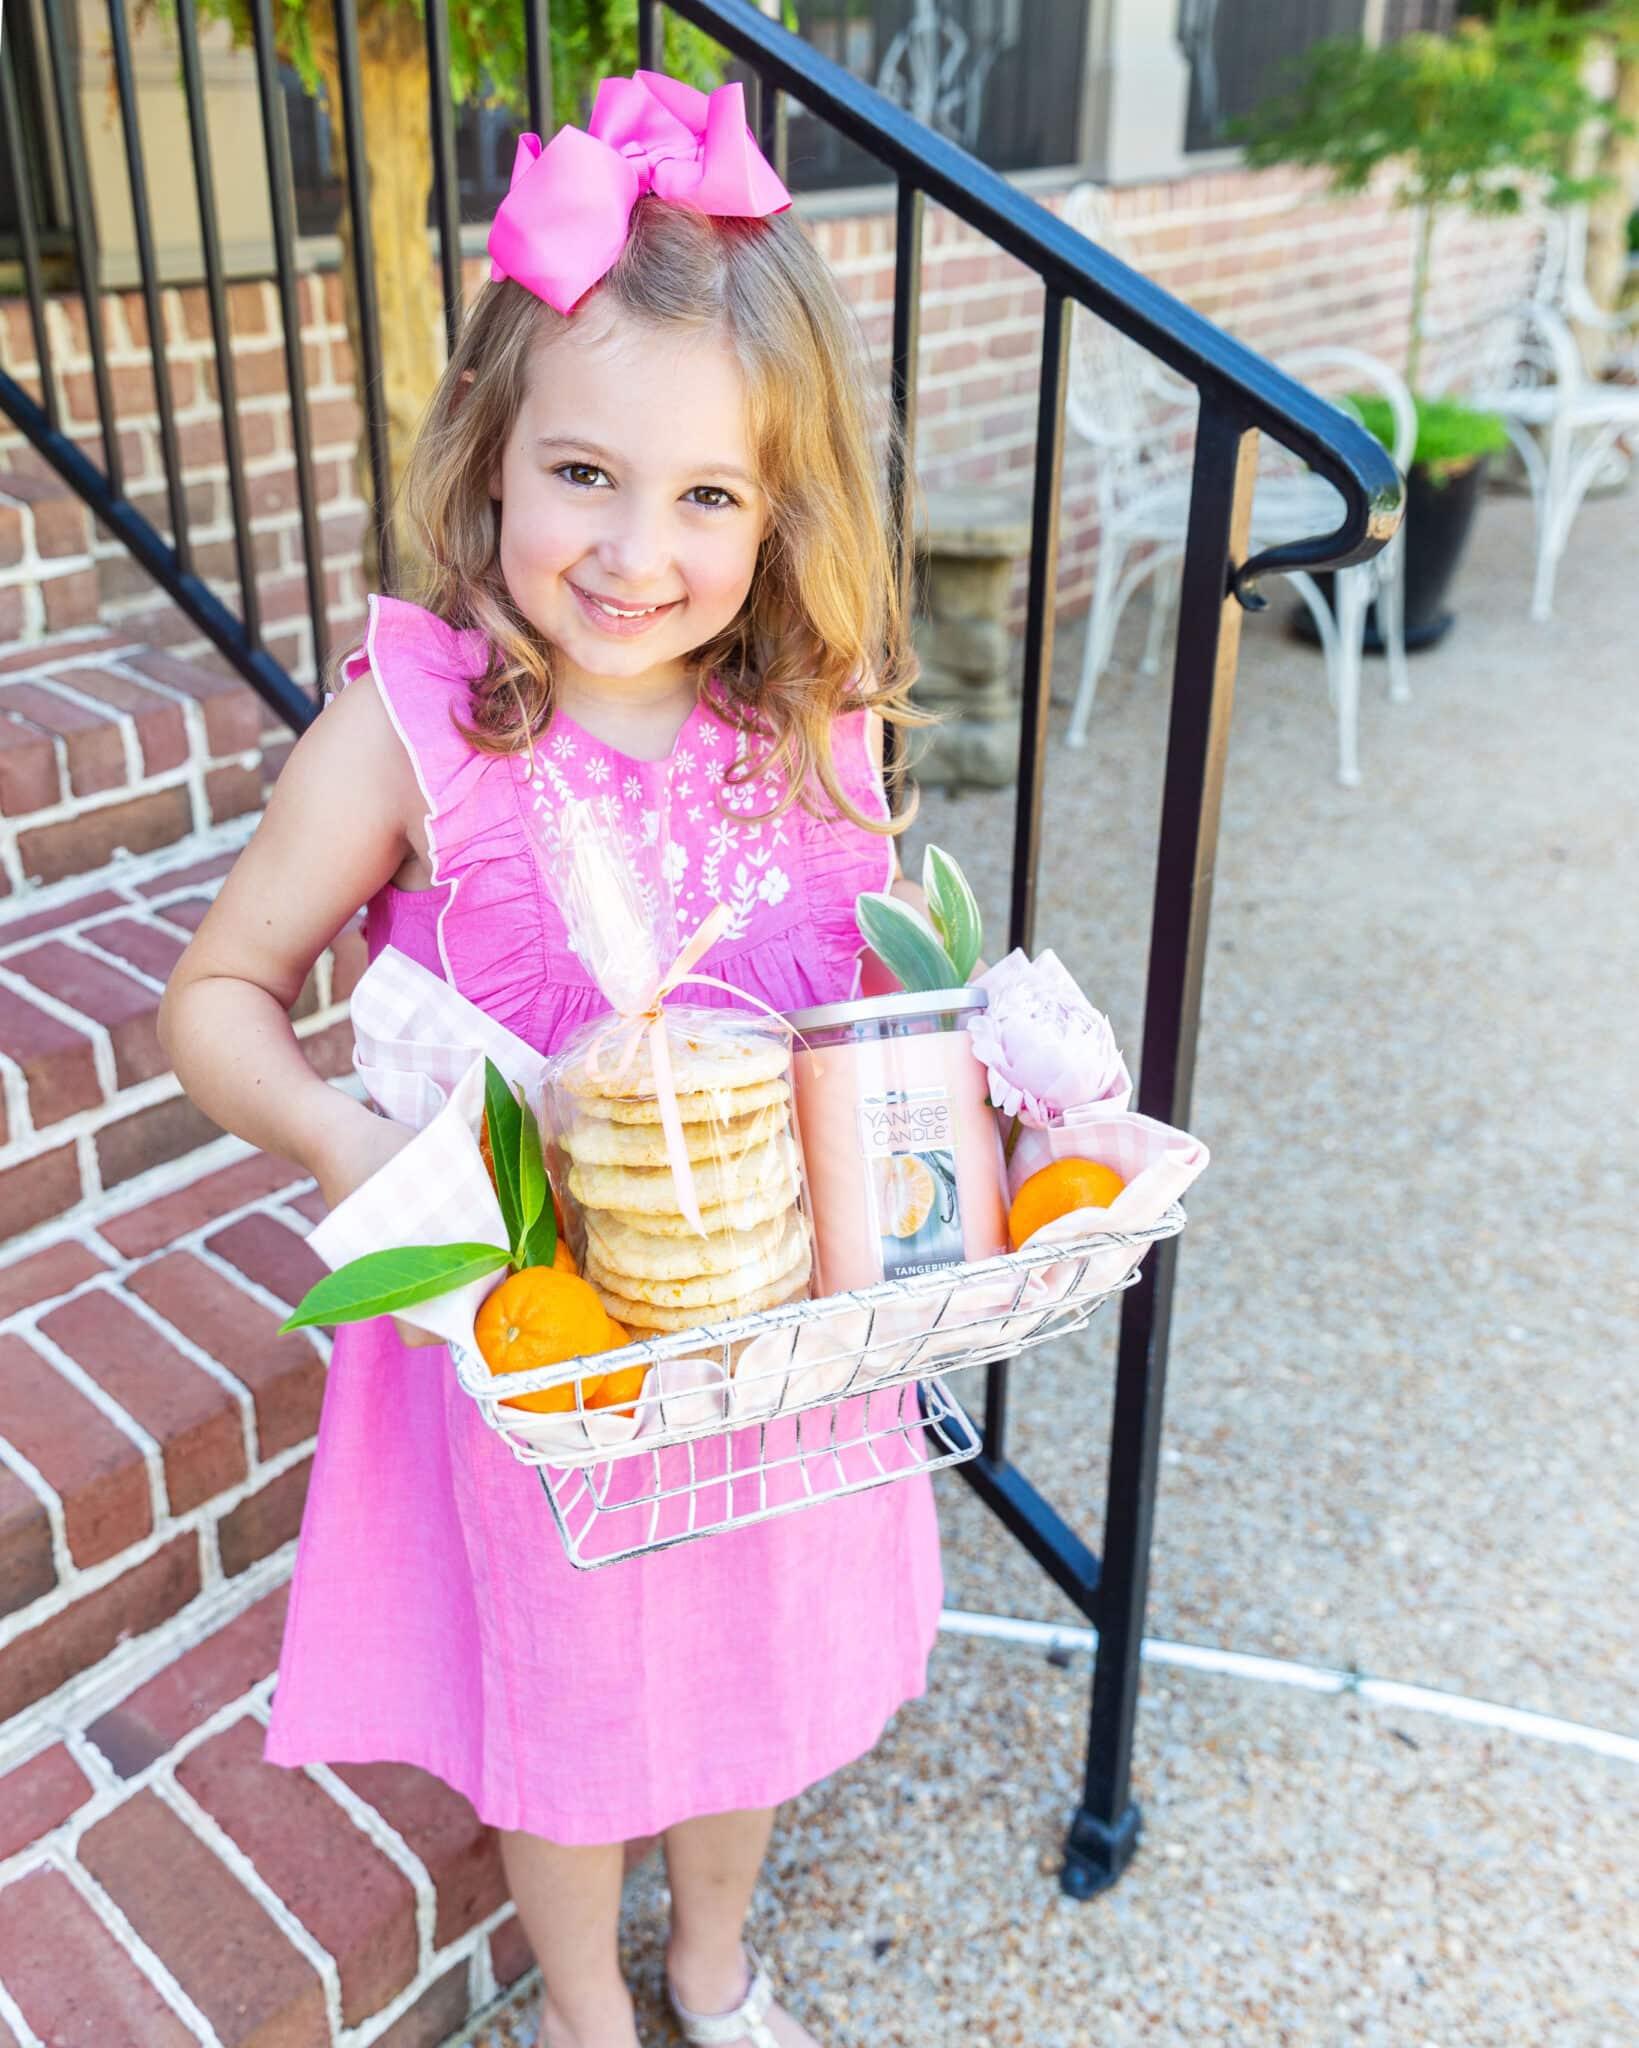 Gifting Cookies to Neighbor